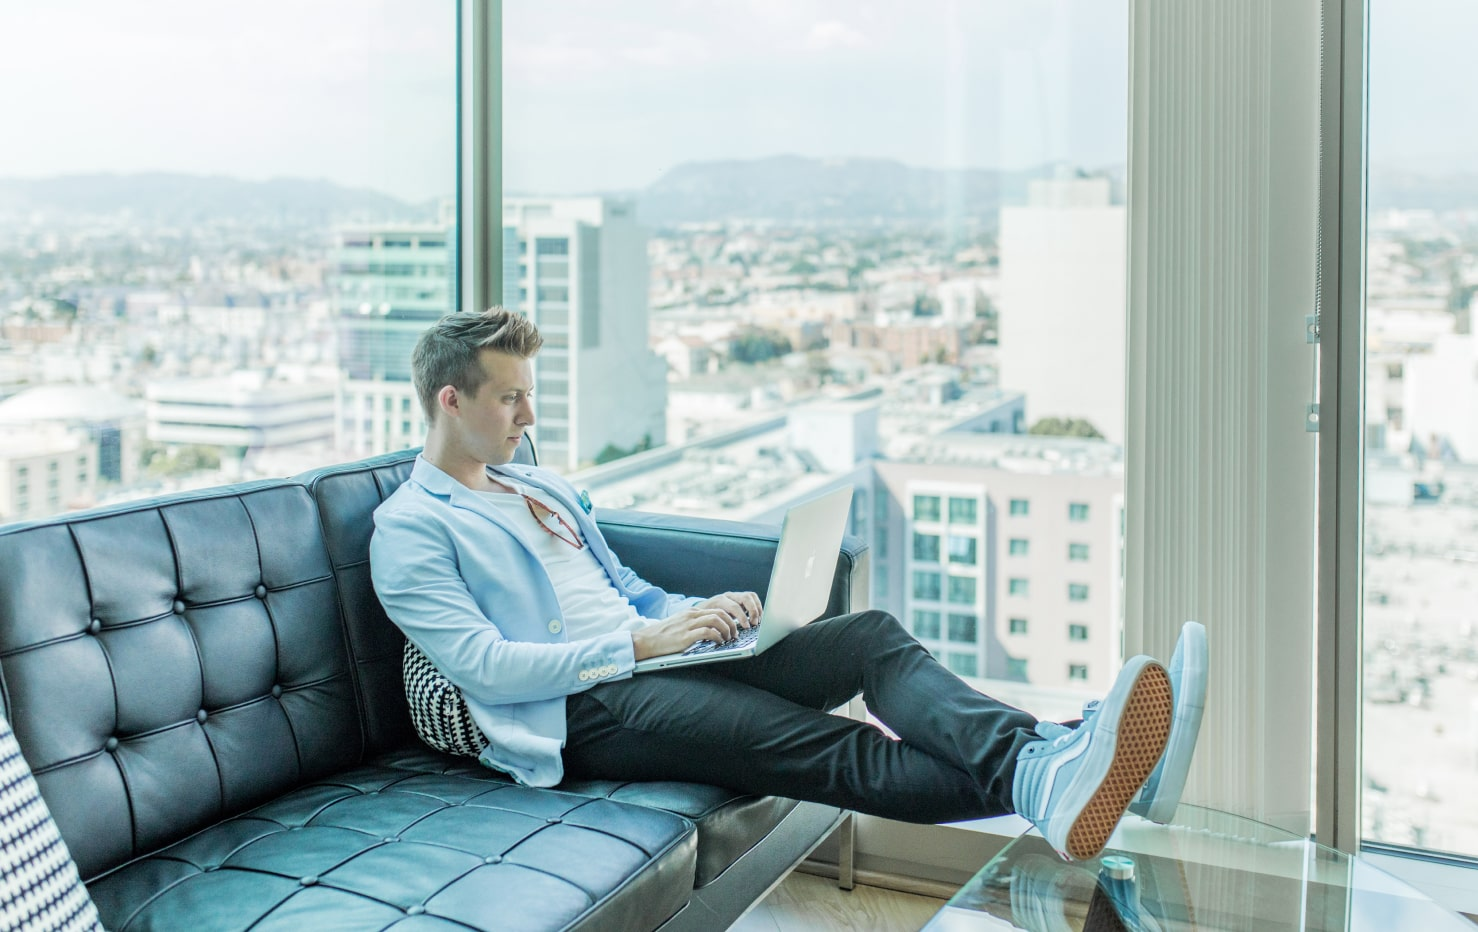 Man in office sitting on sofa